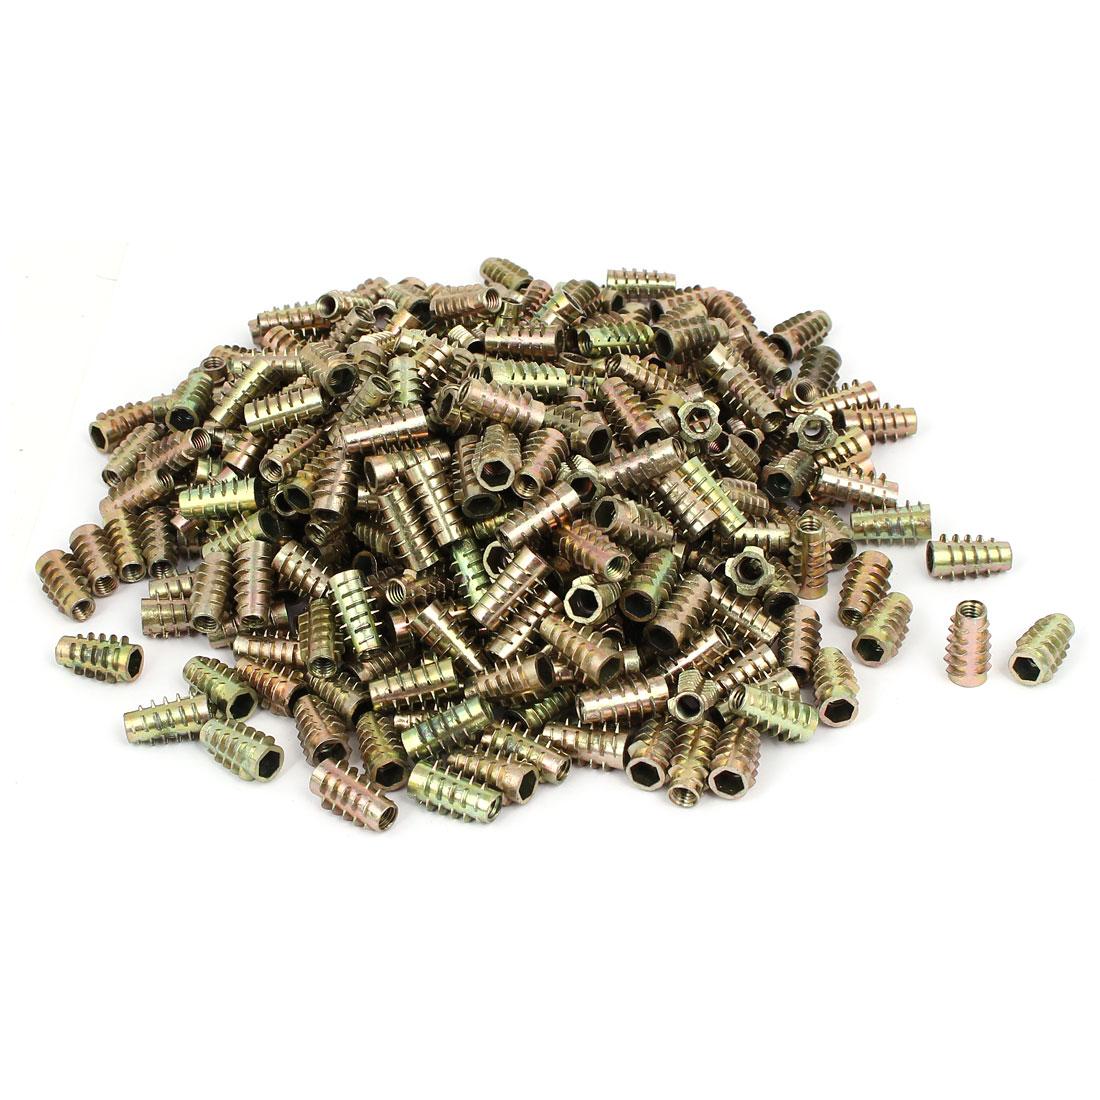 Wood Furniture Zinc Alloy Hex Socket Insert Screws E-Nuts M6 x 20mm 500pcs